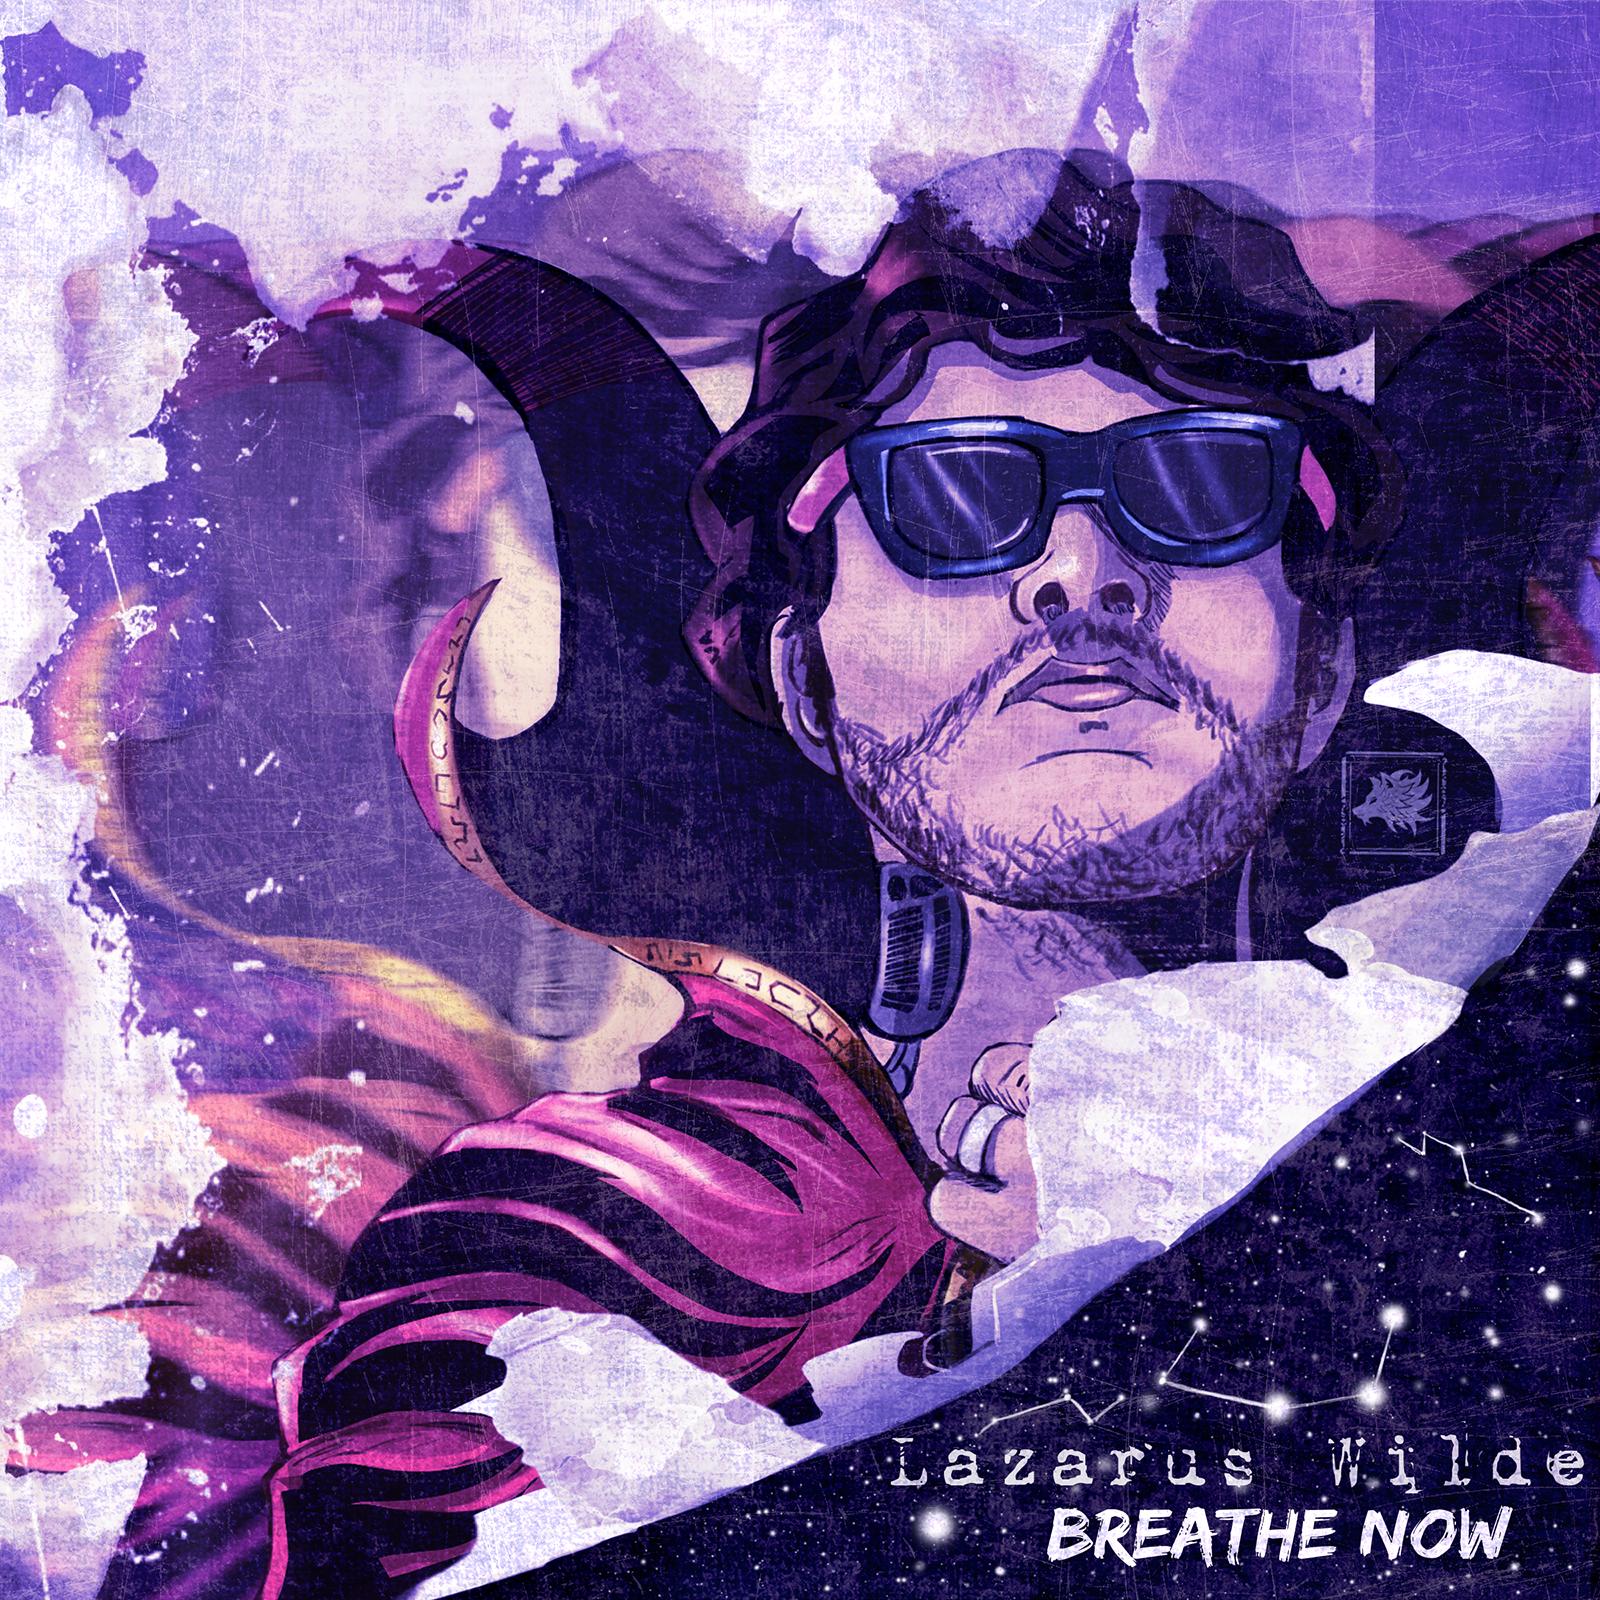 Lazarus Wilde - 'Breathe Now' LP